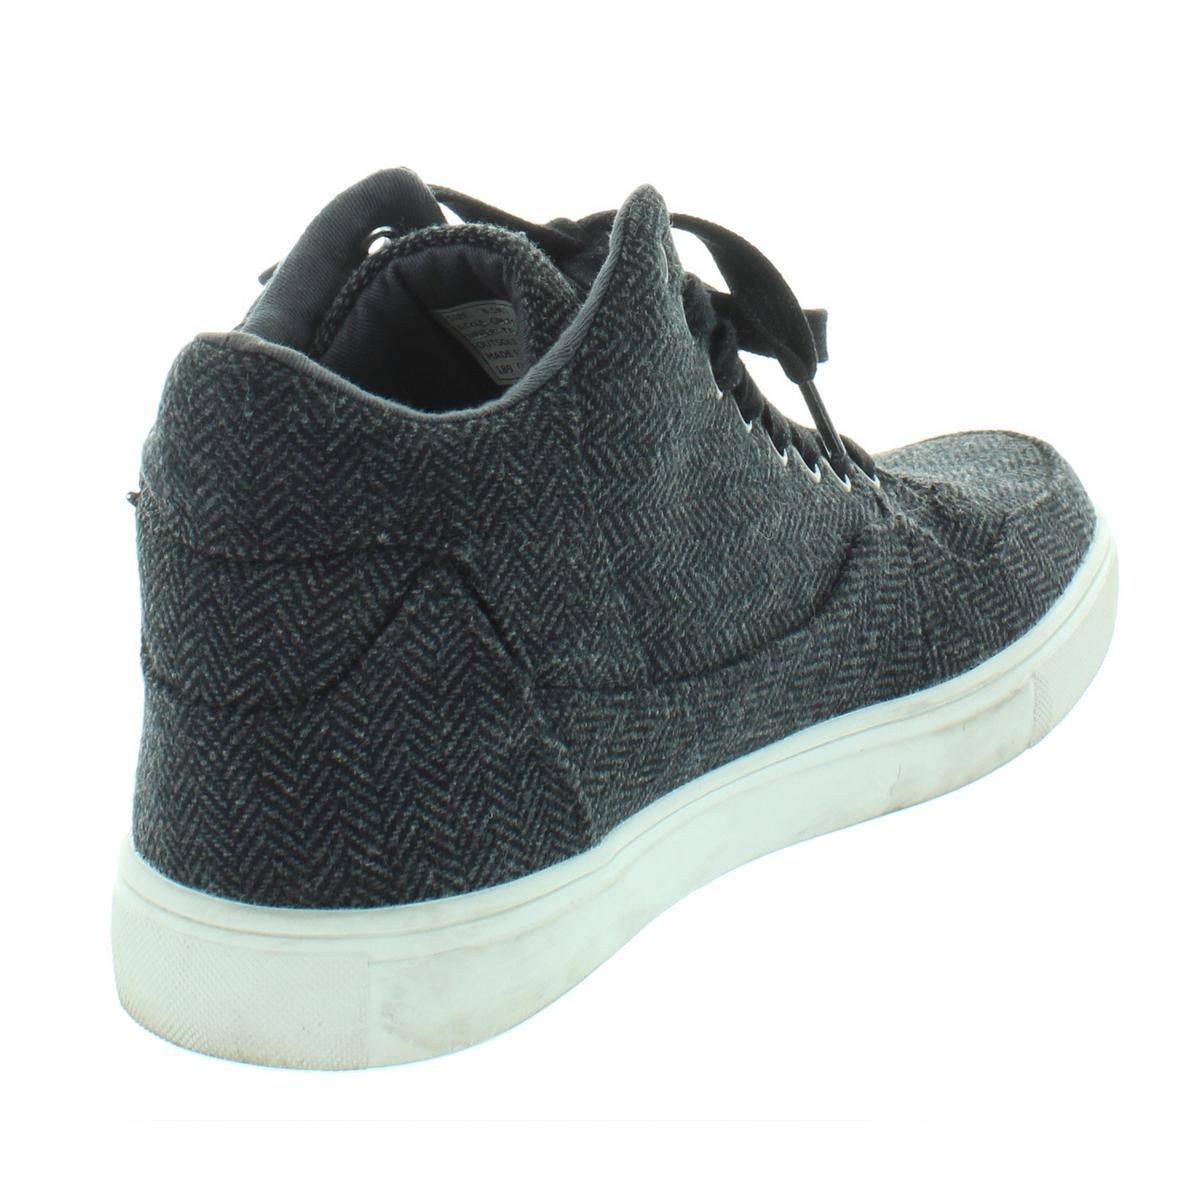 d5db5ff72258 Details about Guess Mens Towman Black High Top Fashion Sneakers Shoes 8.5  Medium (D) BHFO 9913